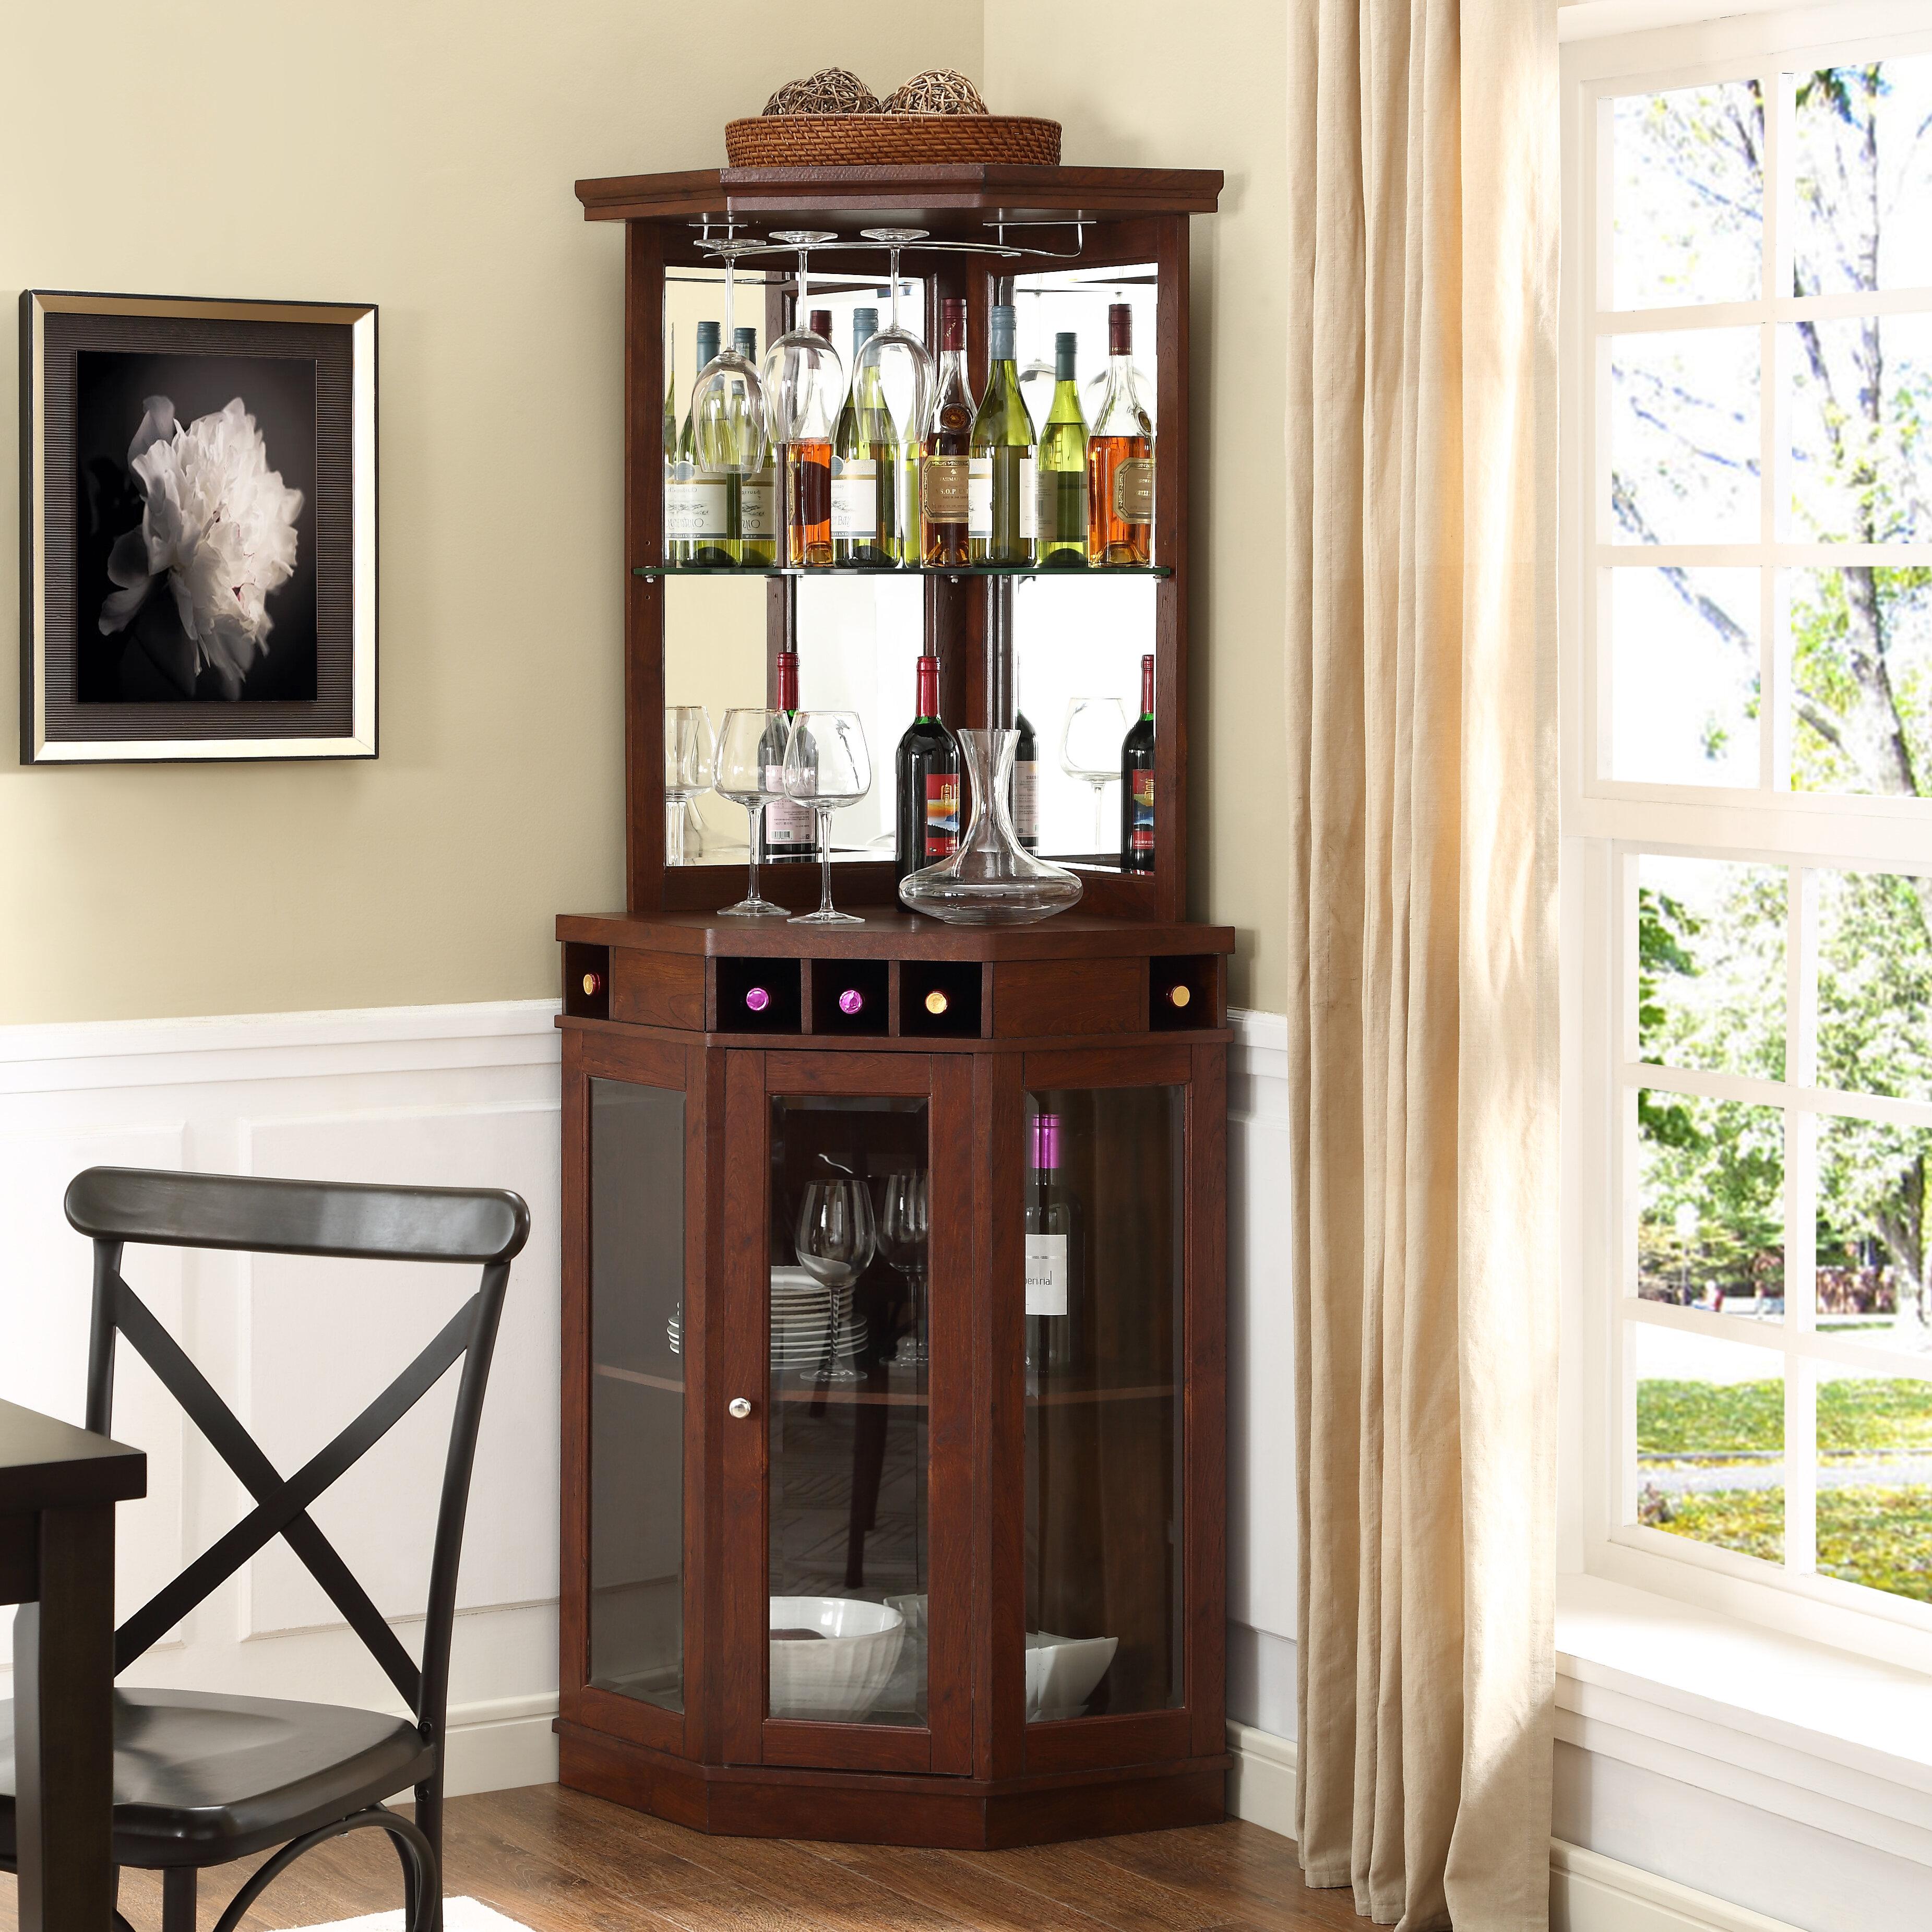 Mahogany Corner Arms Bar with Wine Storage